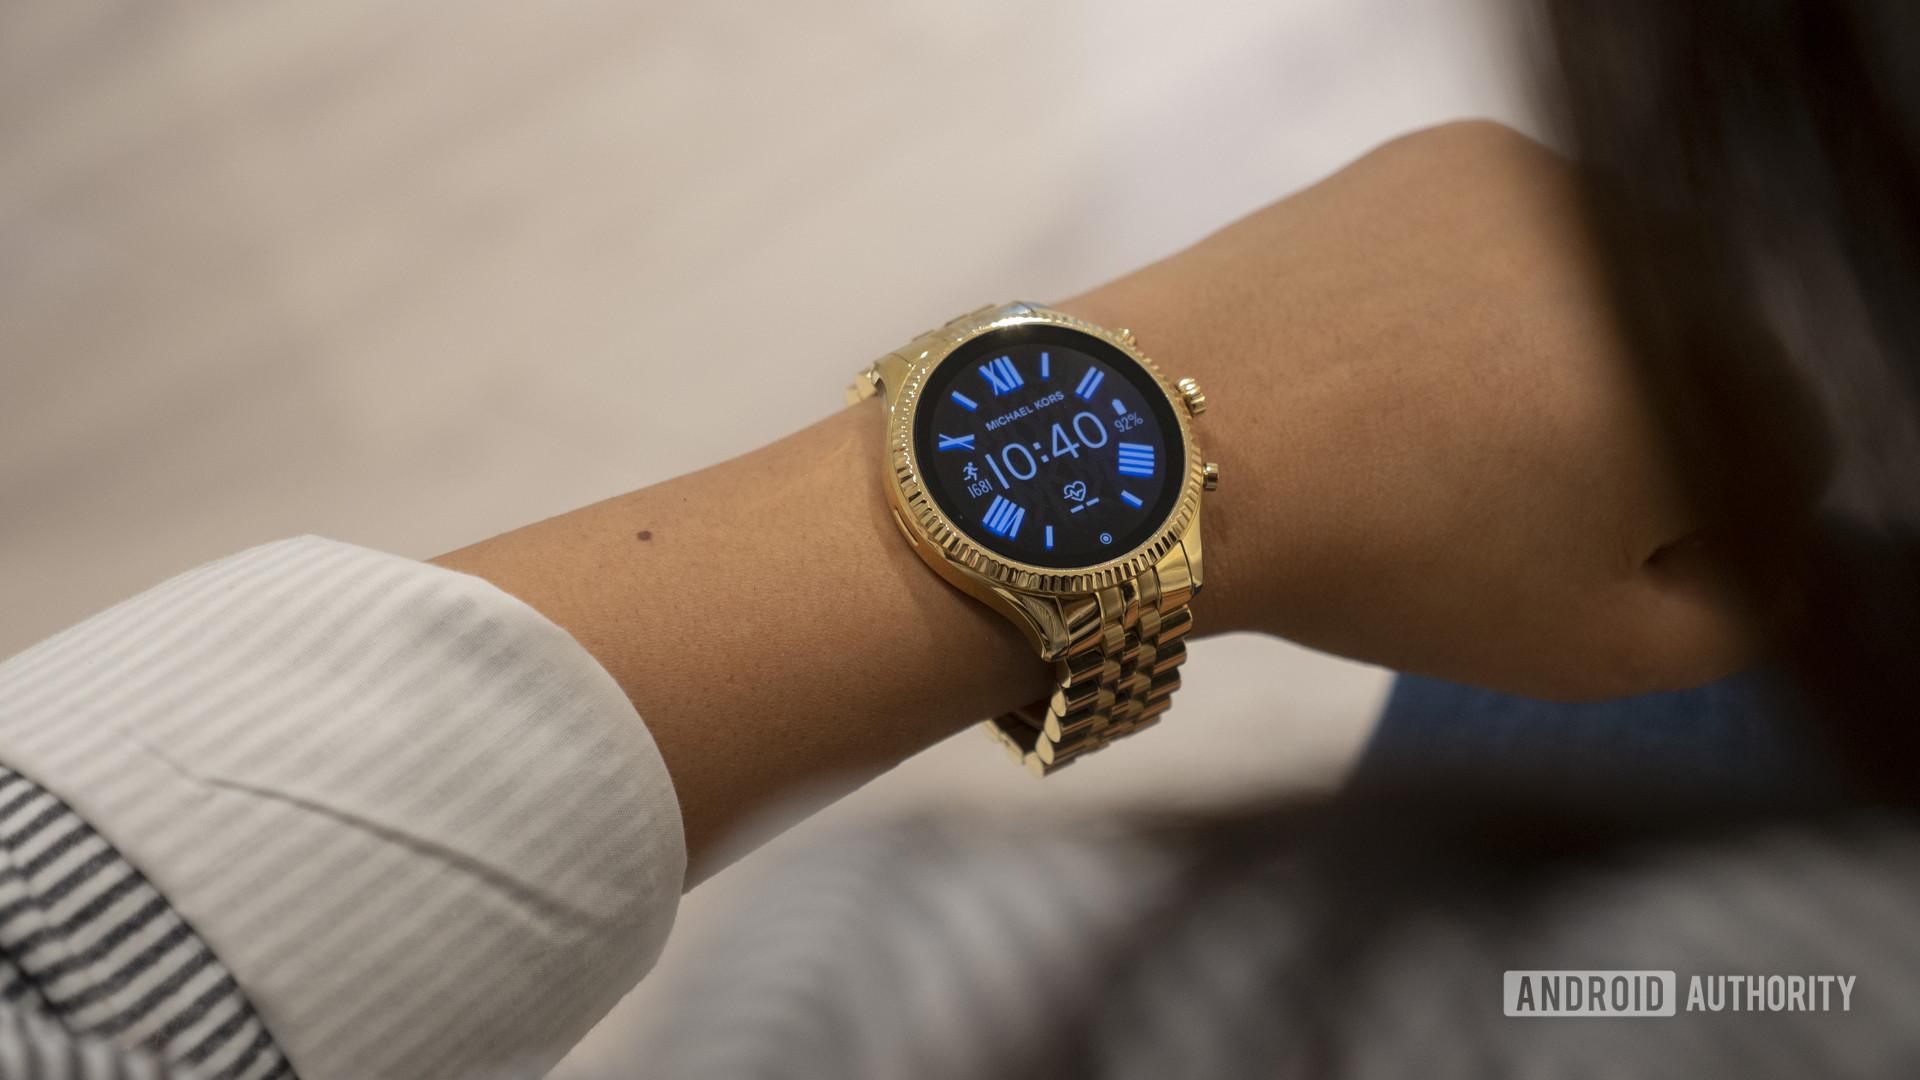 Michael Kors Lexington 2 Wear OS 1 smartwatch